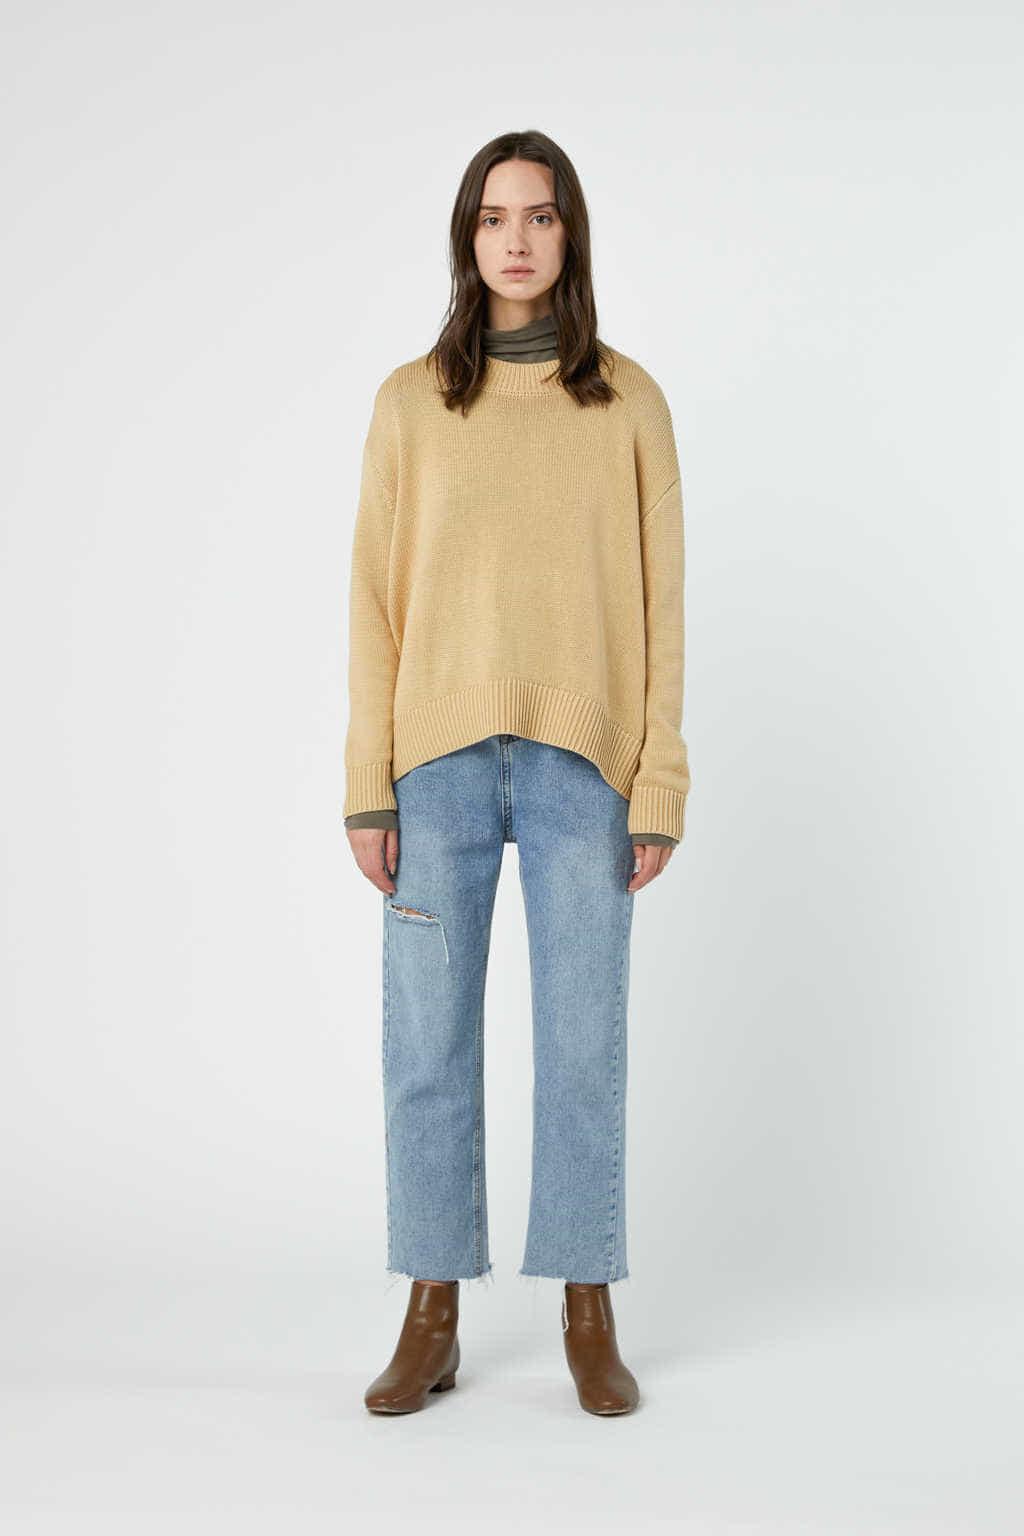 Sweater 3322 Cream 2